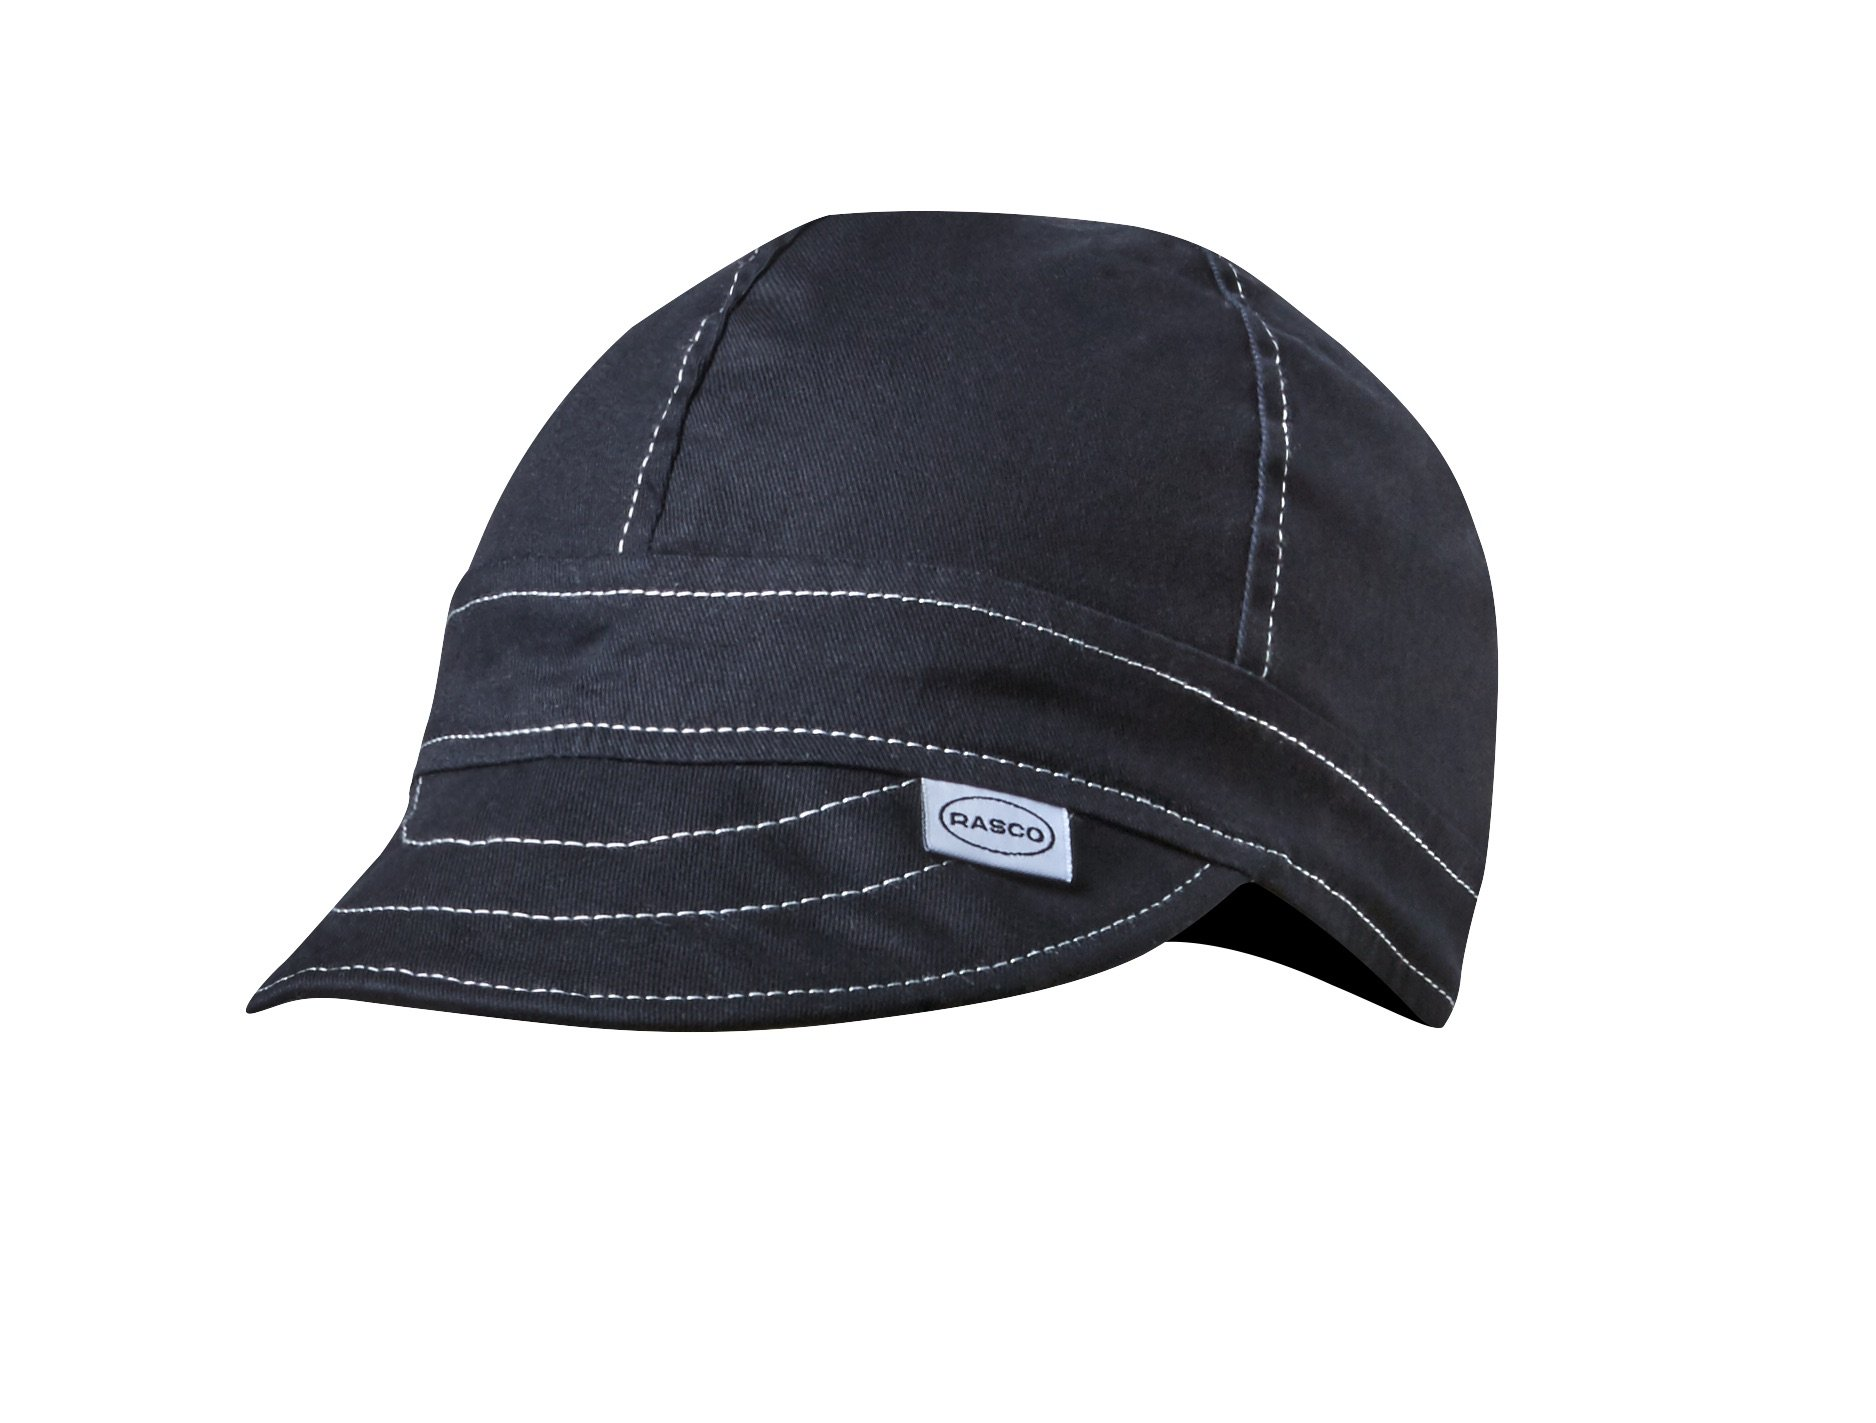 Rasco MFG Black Welders Cap (6 7/8)